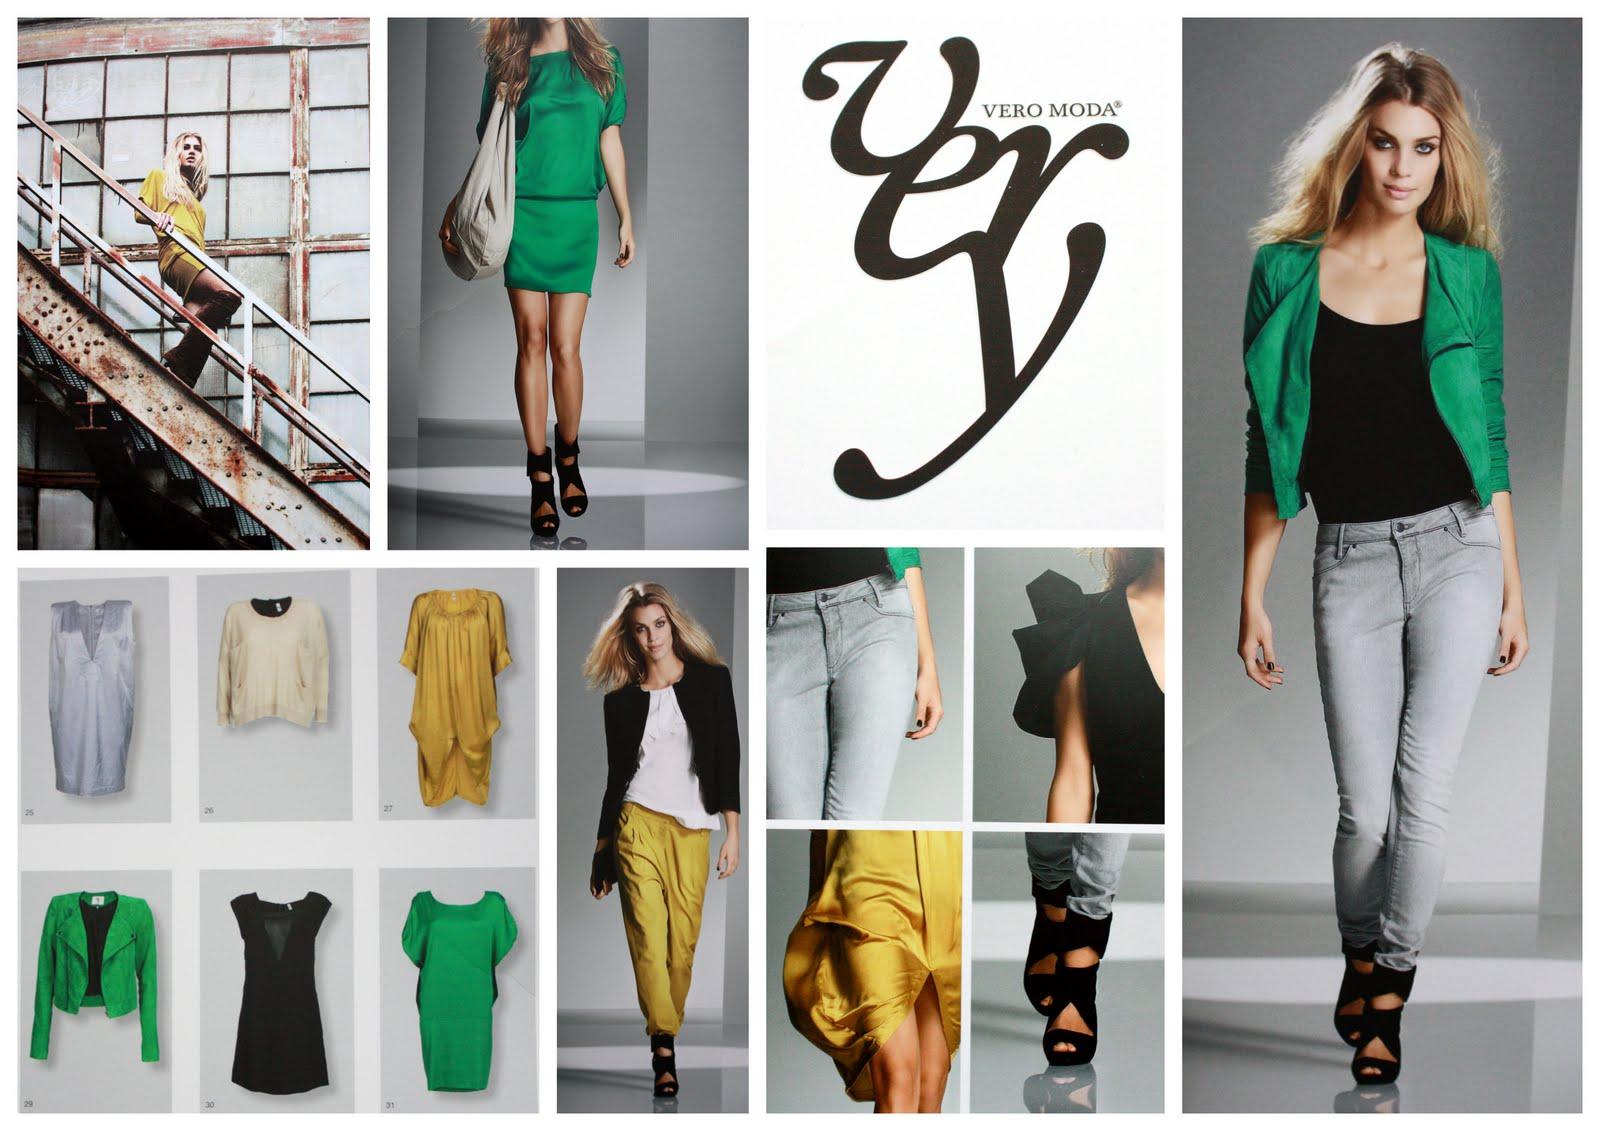 List of fashion items 94